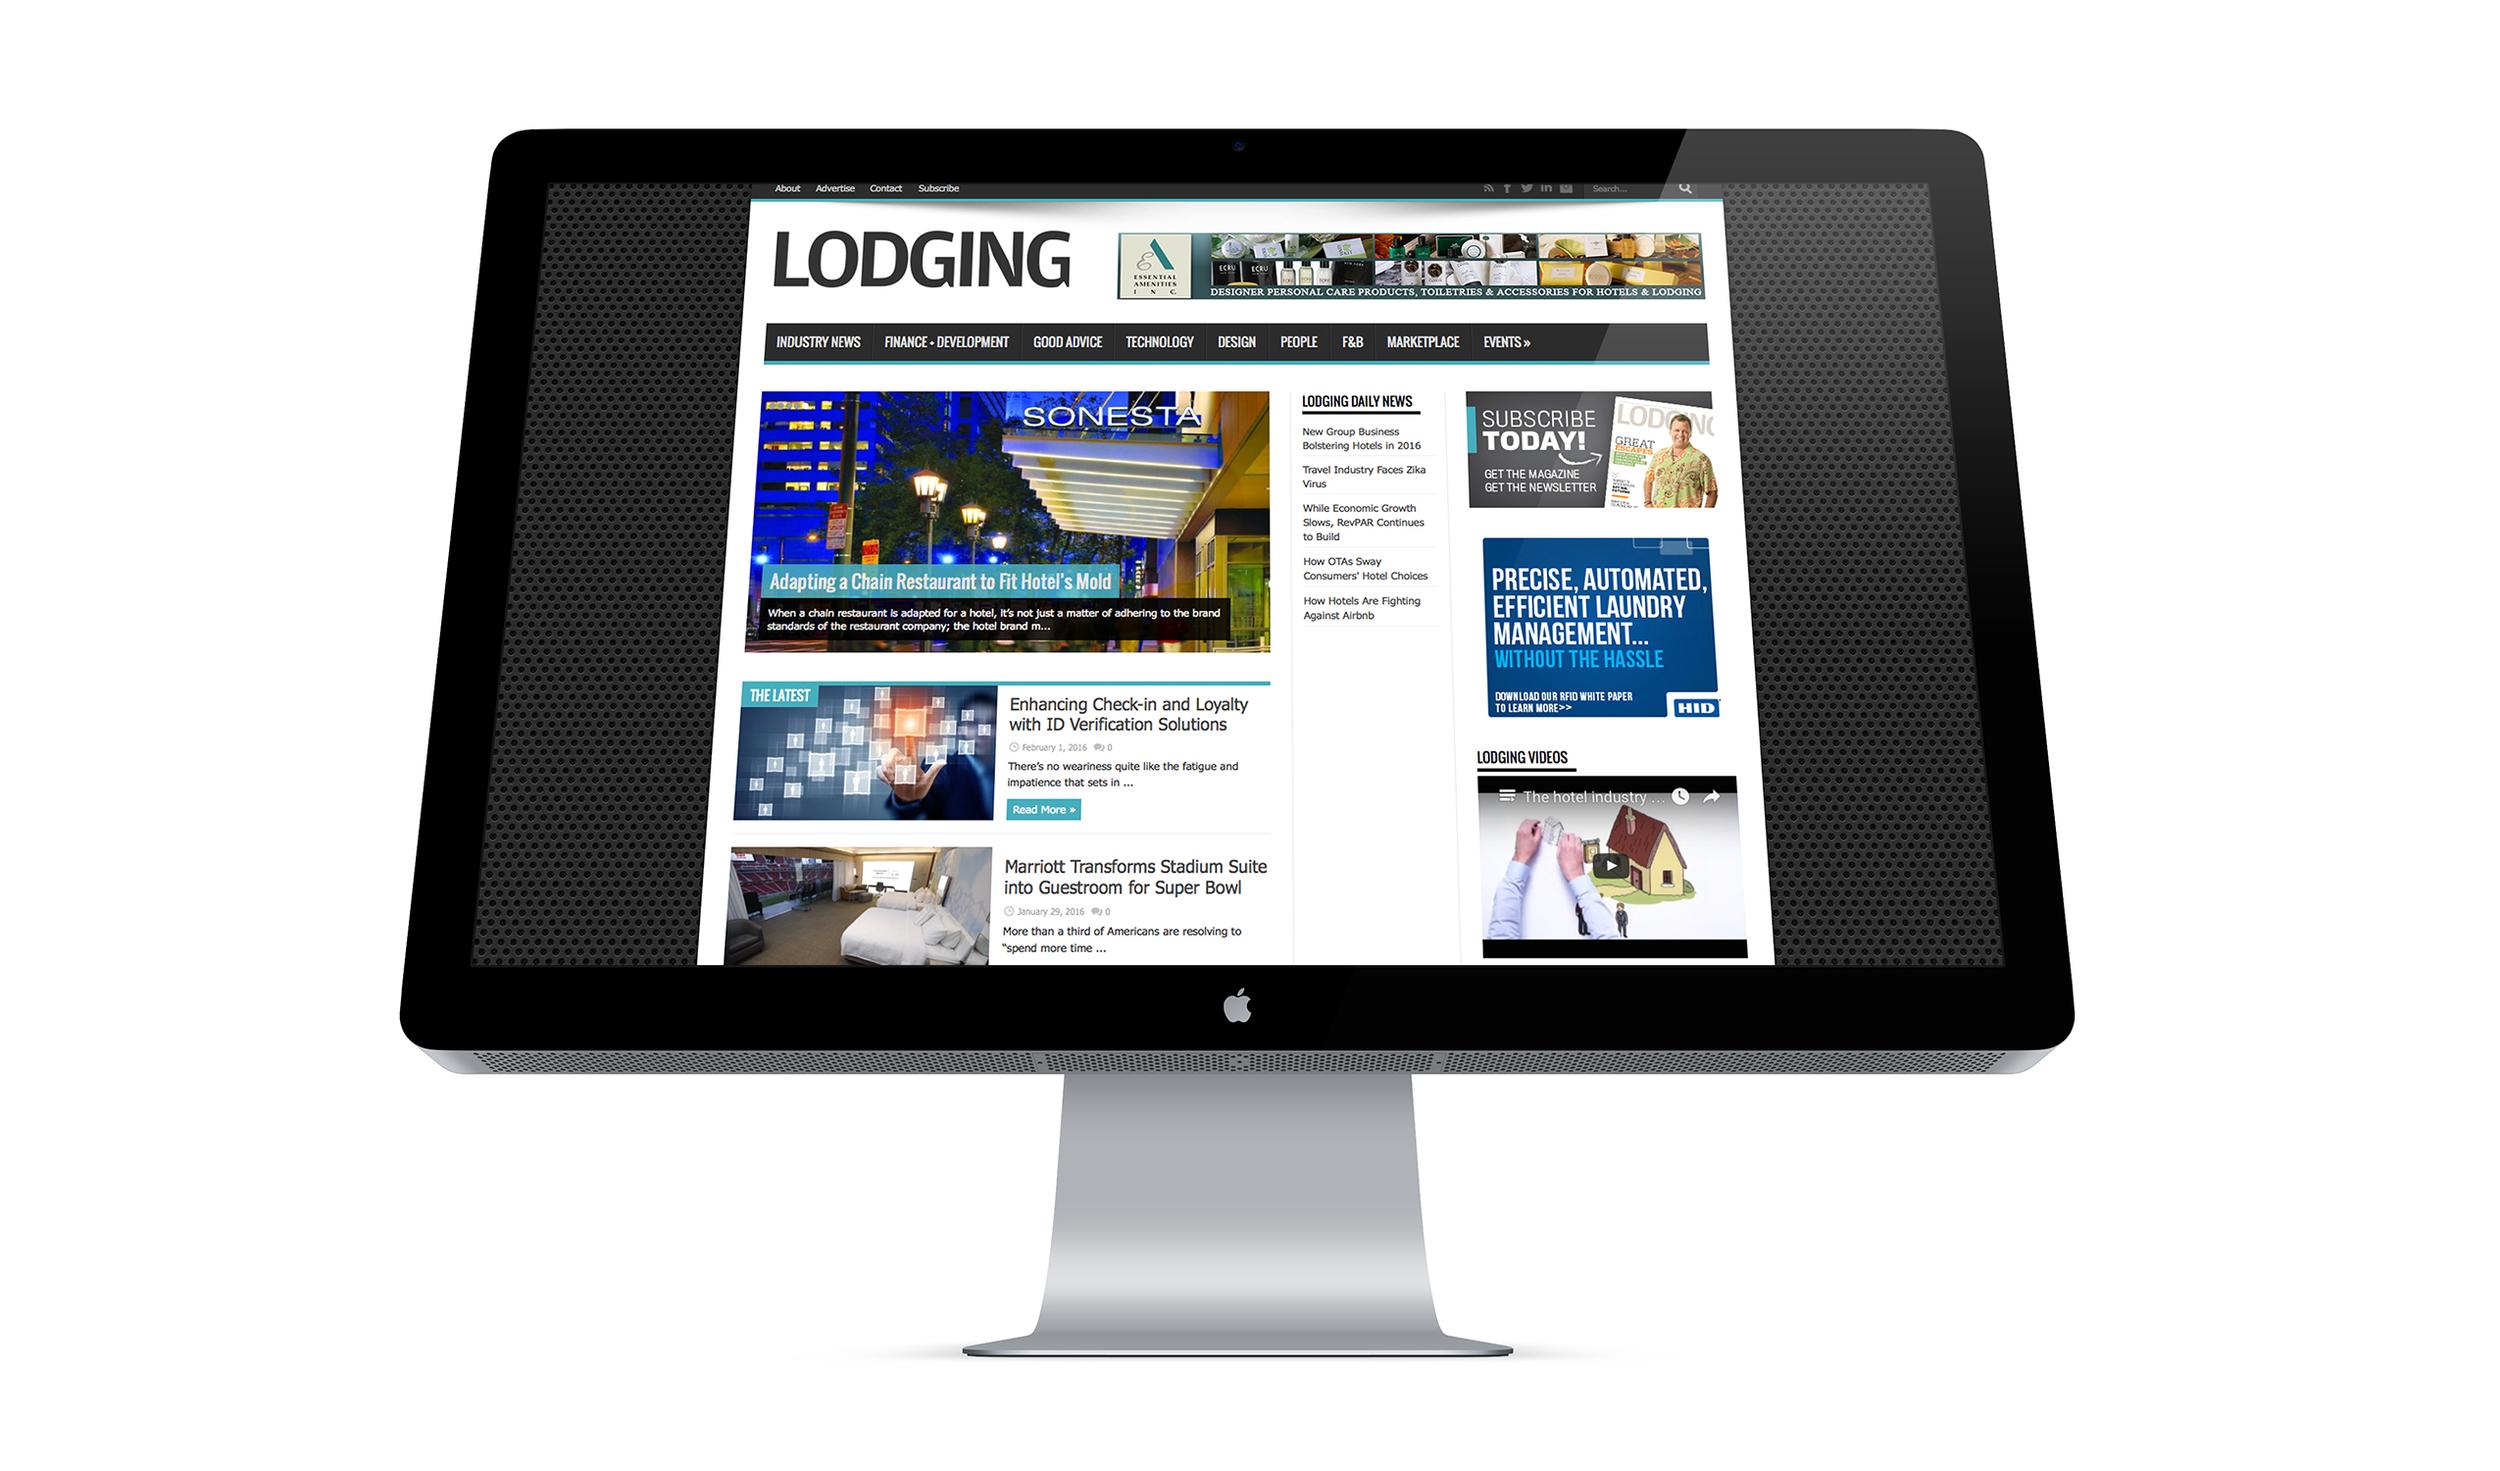 LOD_desktop1.jpg